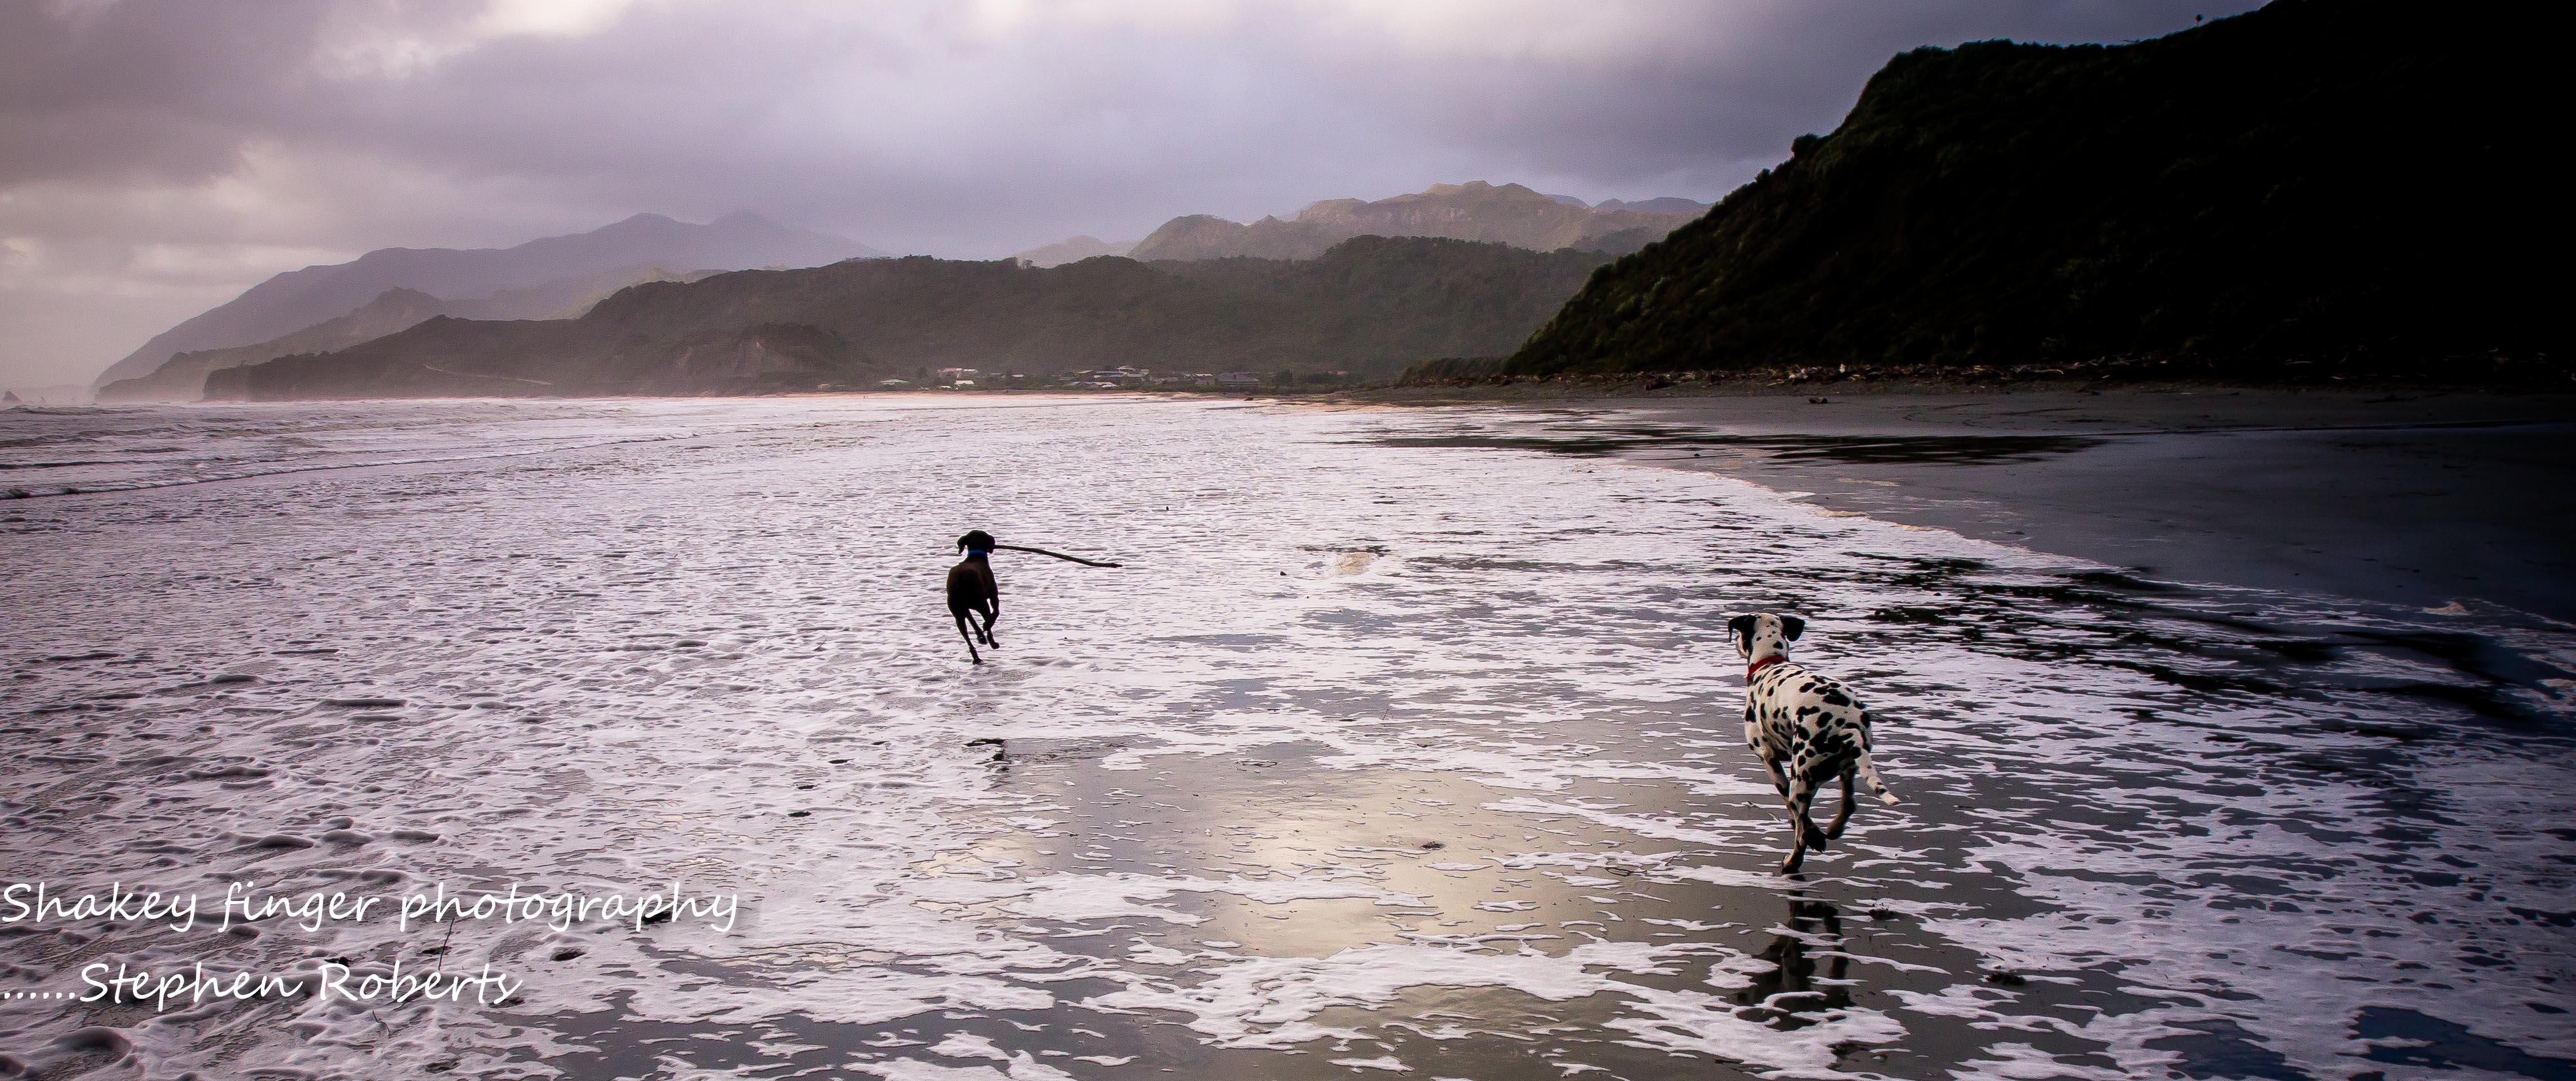 Rapahoe Beach – after the storm | coastingnz